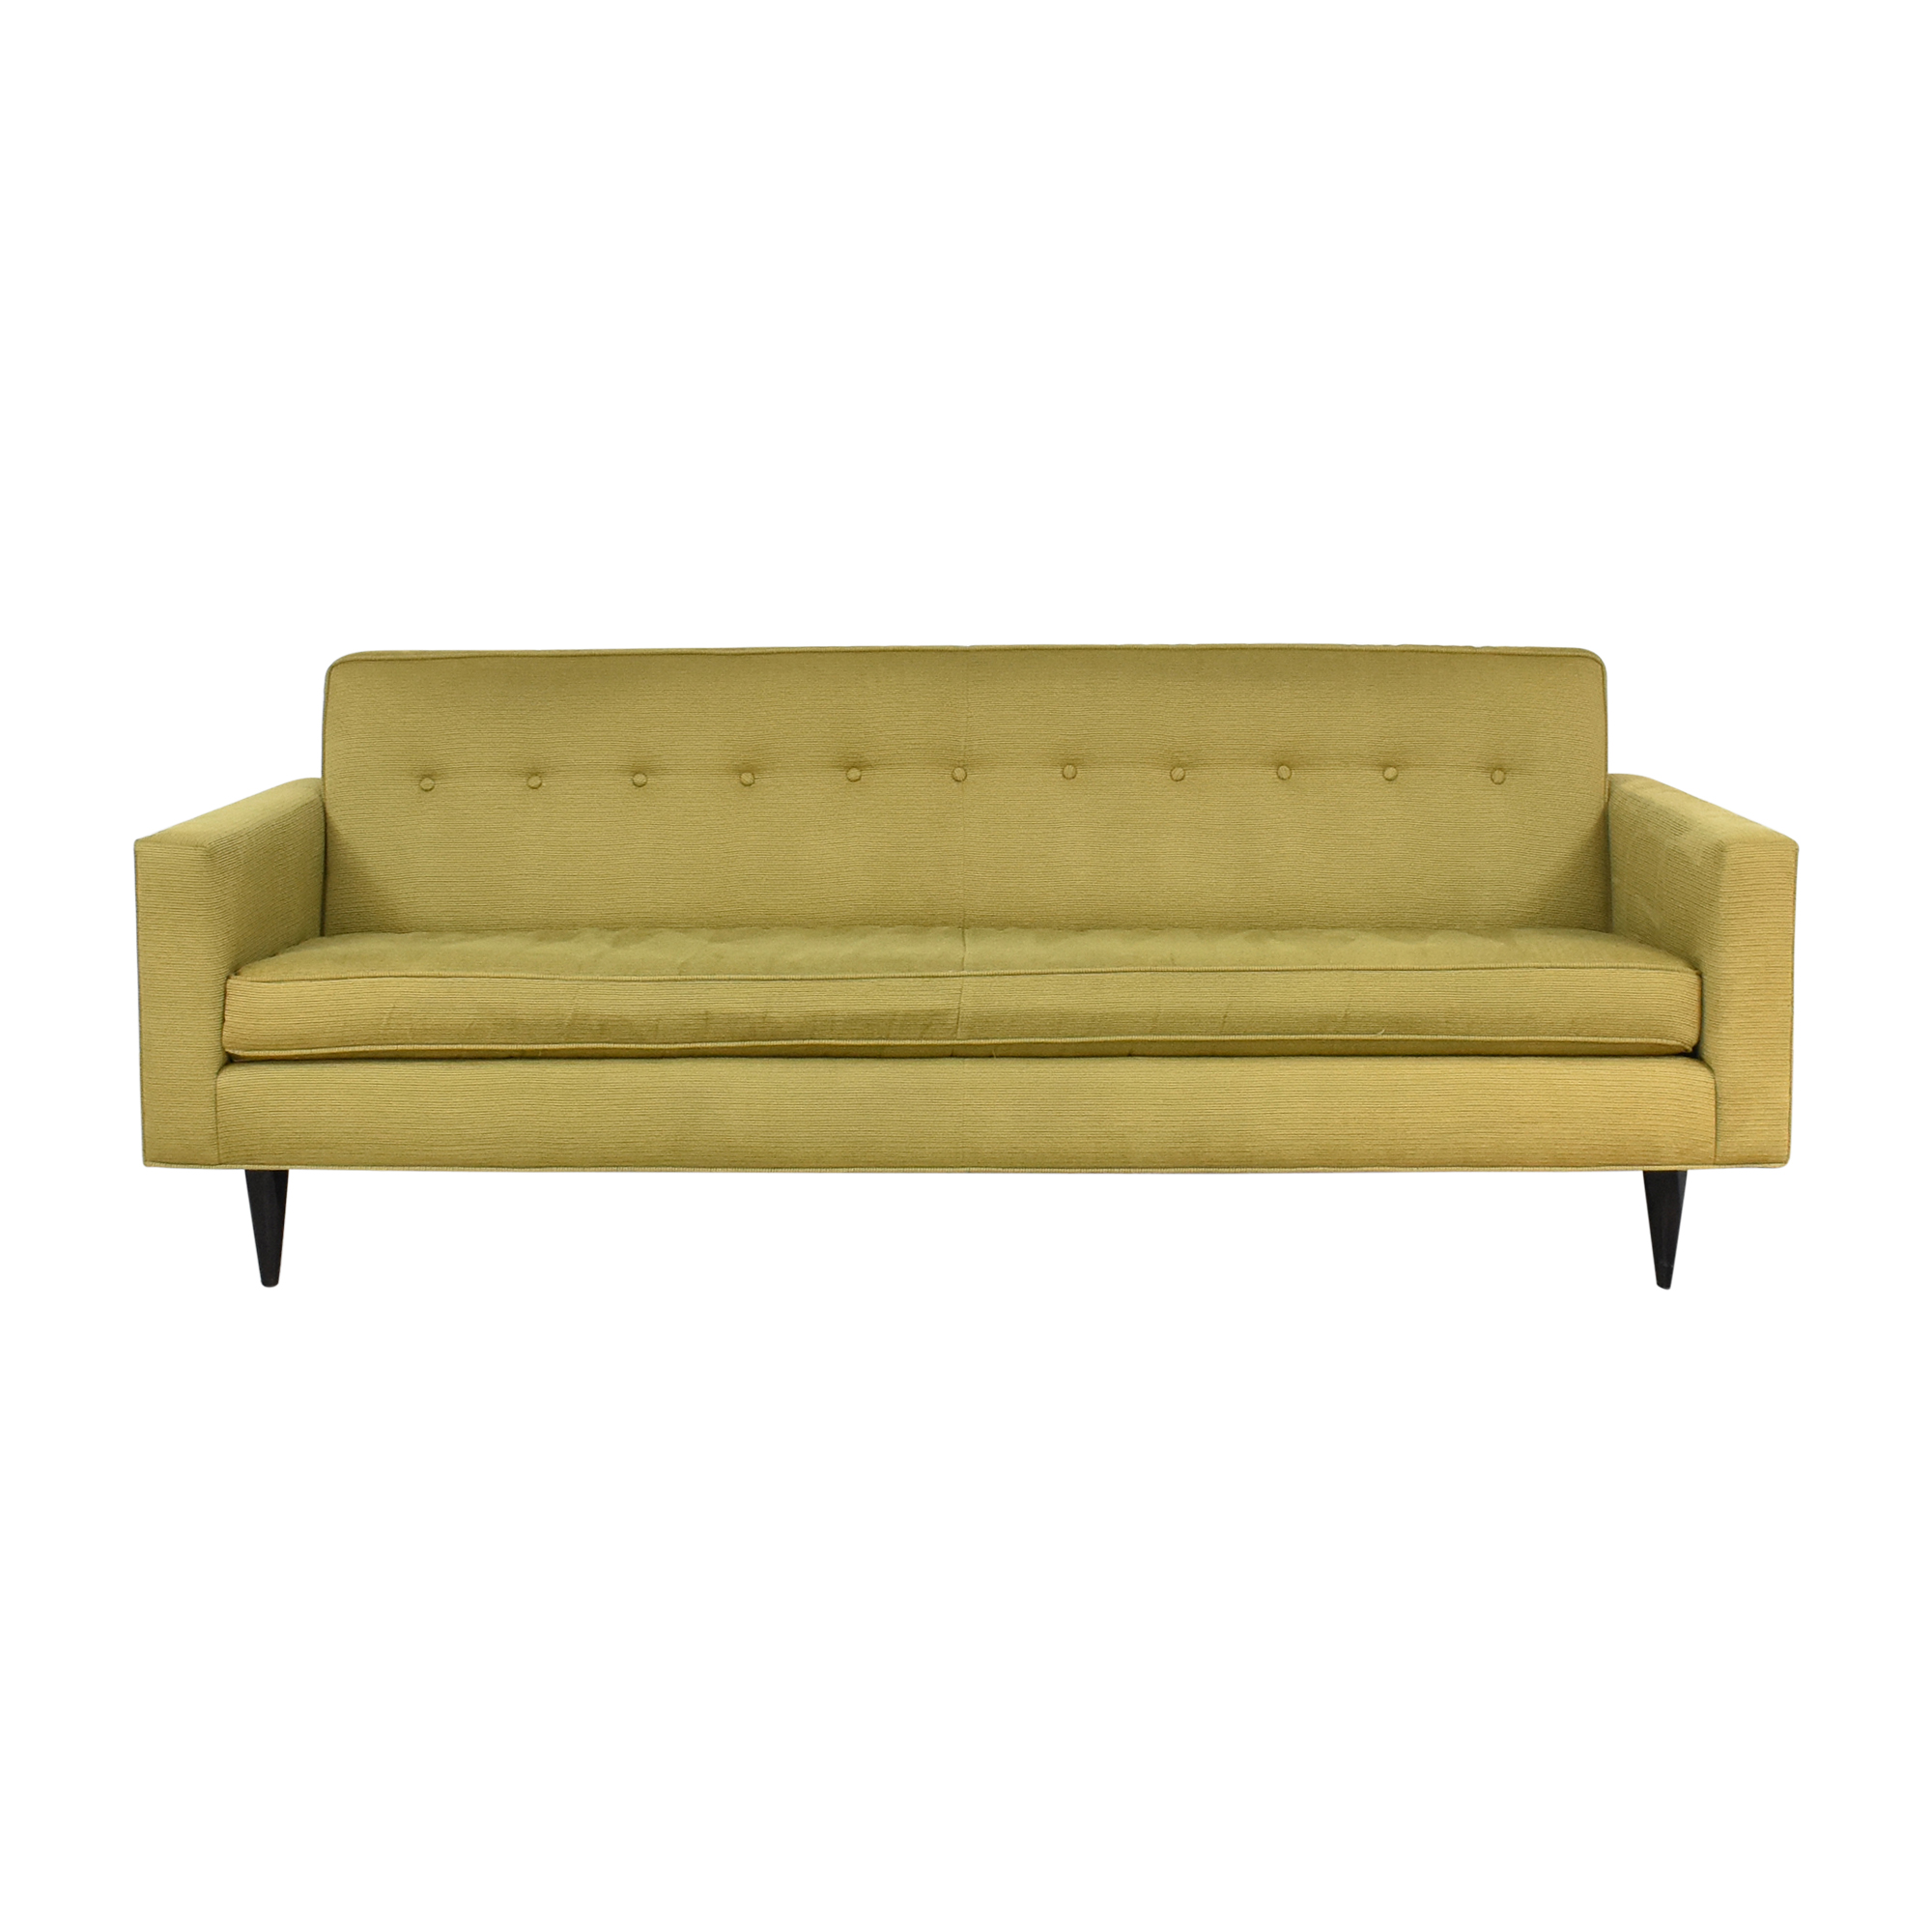 Design Within Reach Design Within Reach Bantam Tufted Sofa price